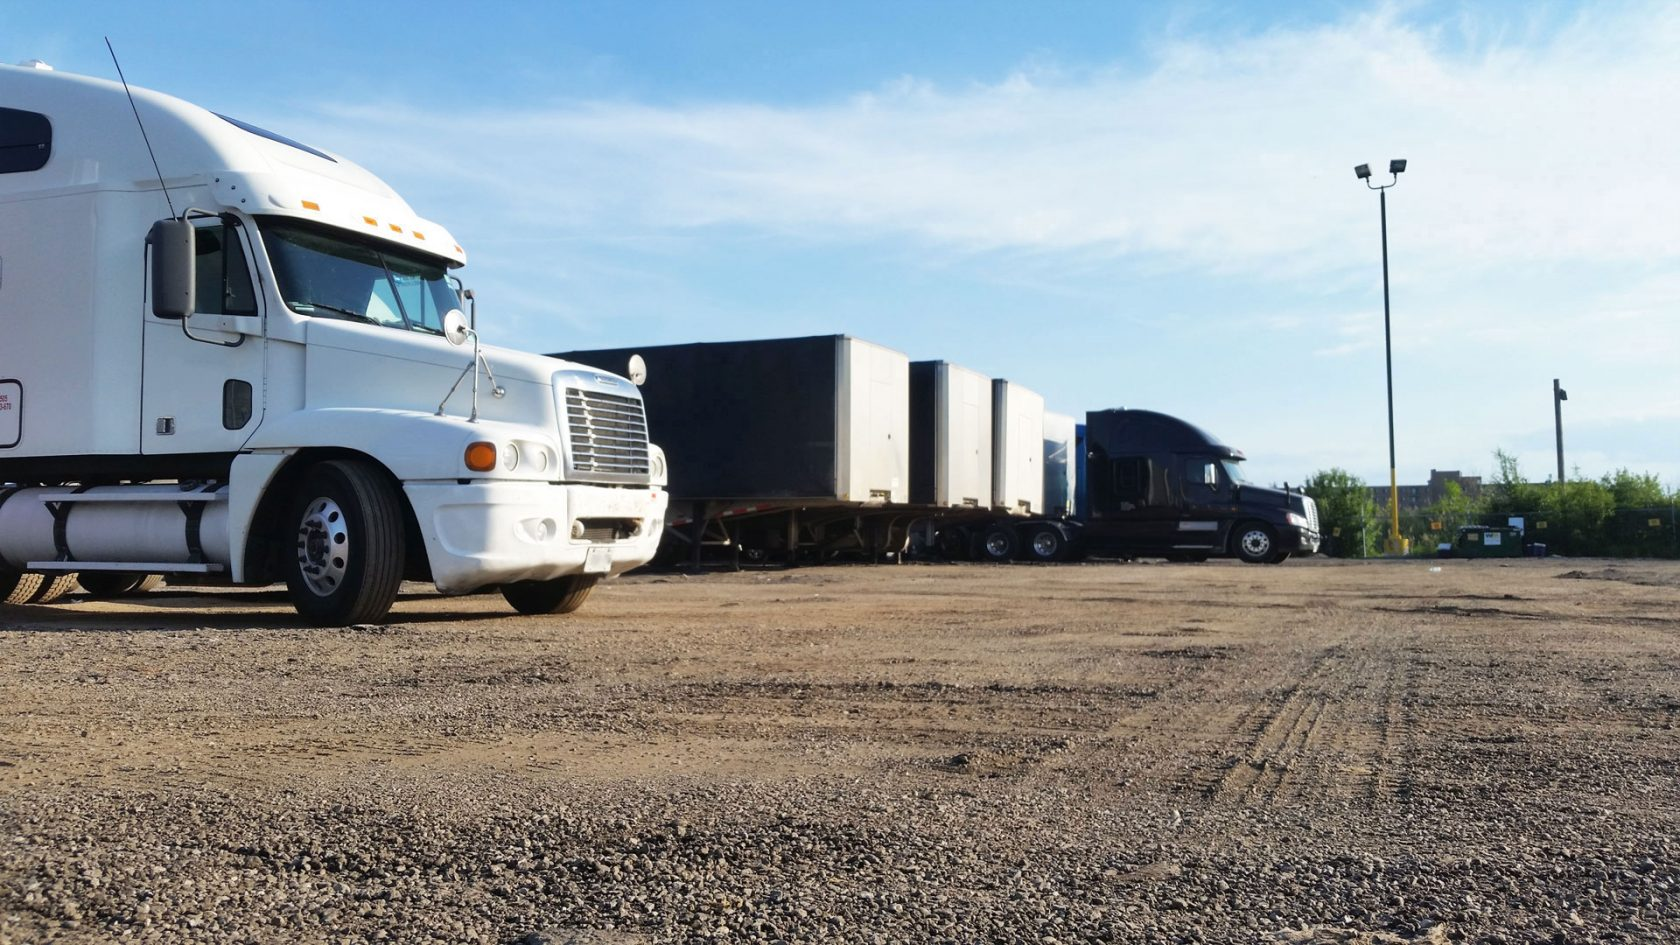 Mobile truck repair company Toronto